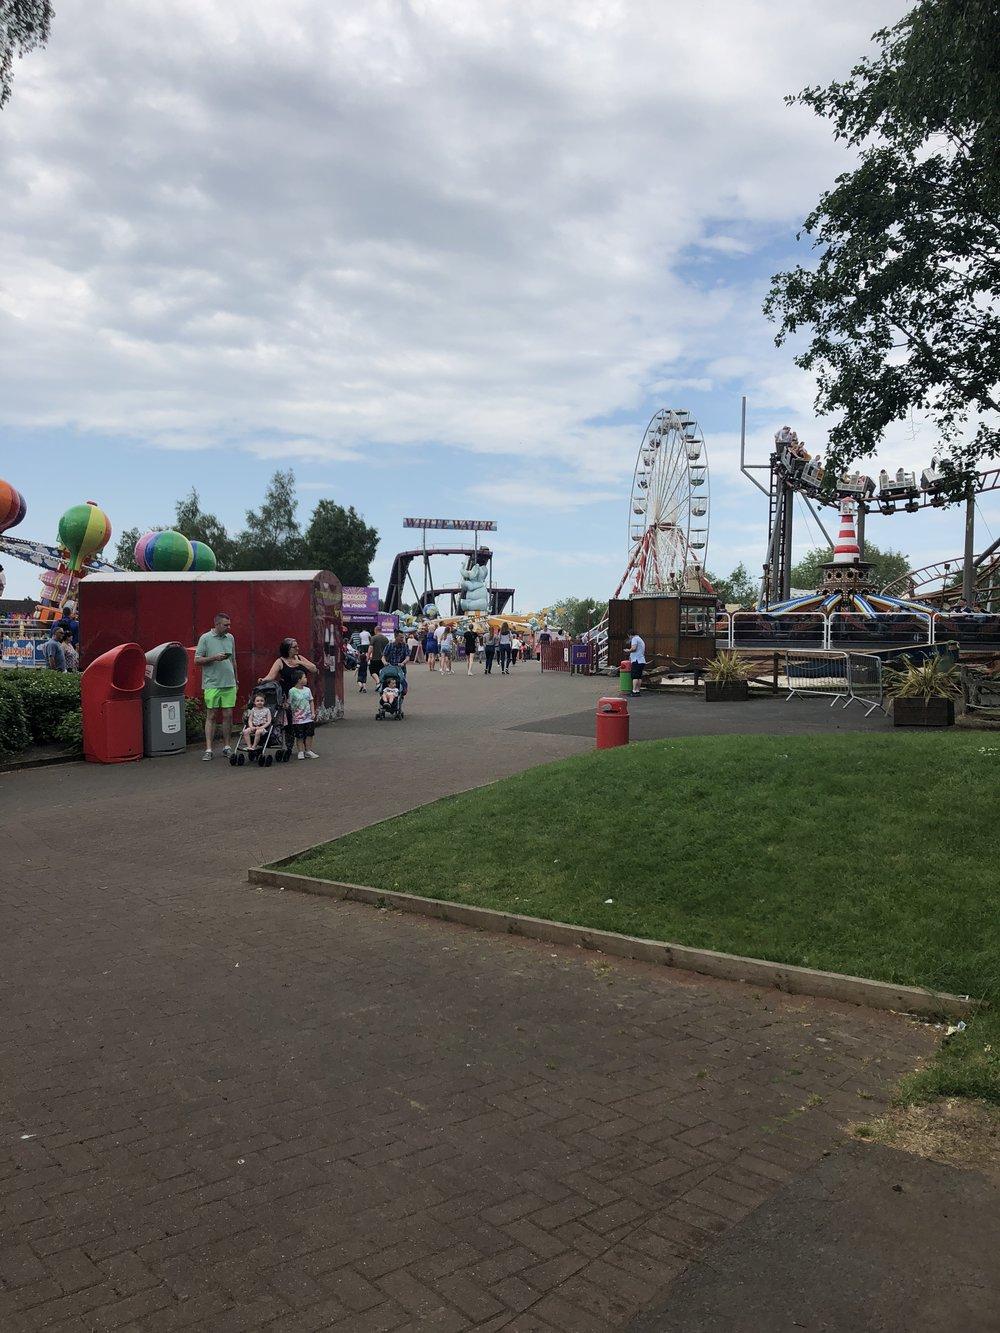 Visited a Theme Park